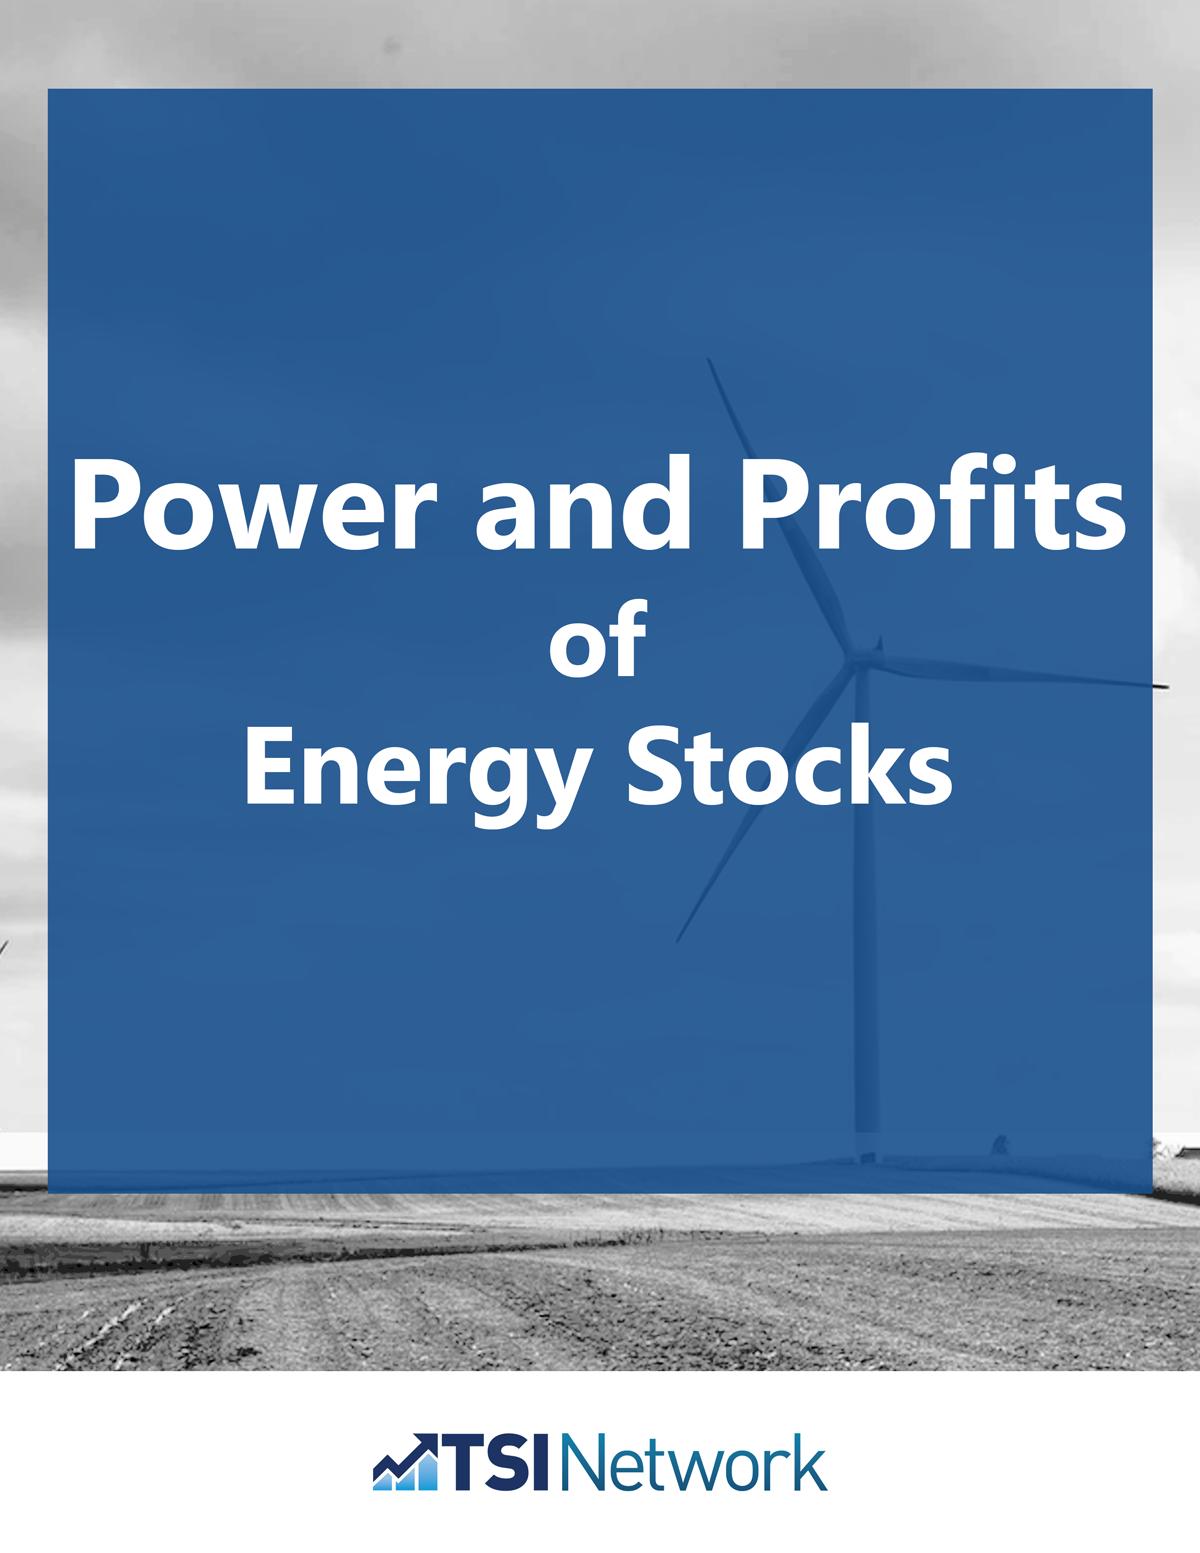 Power and Profits of Energy Stocks